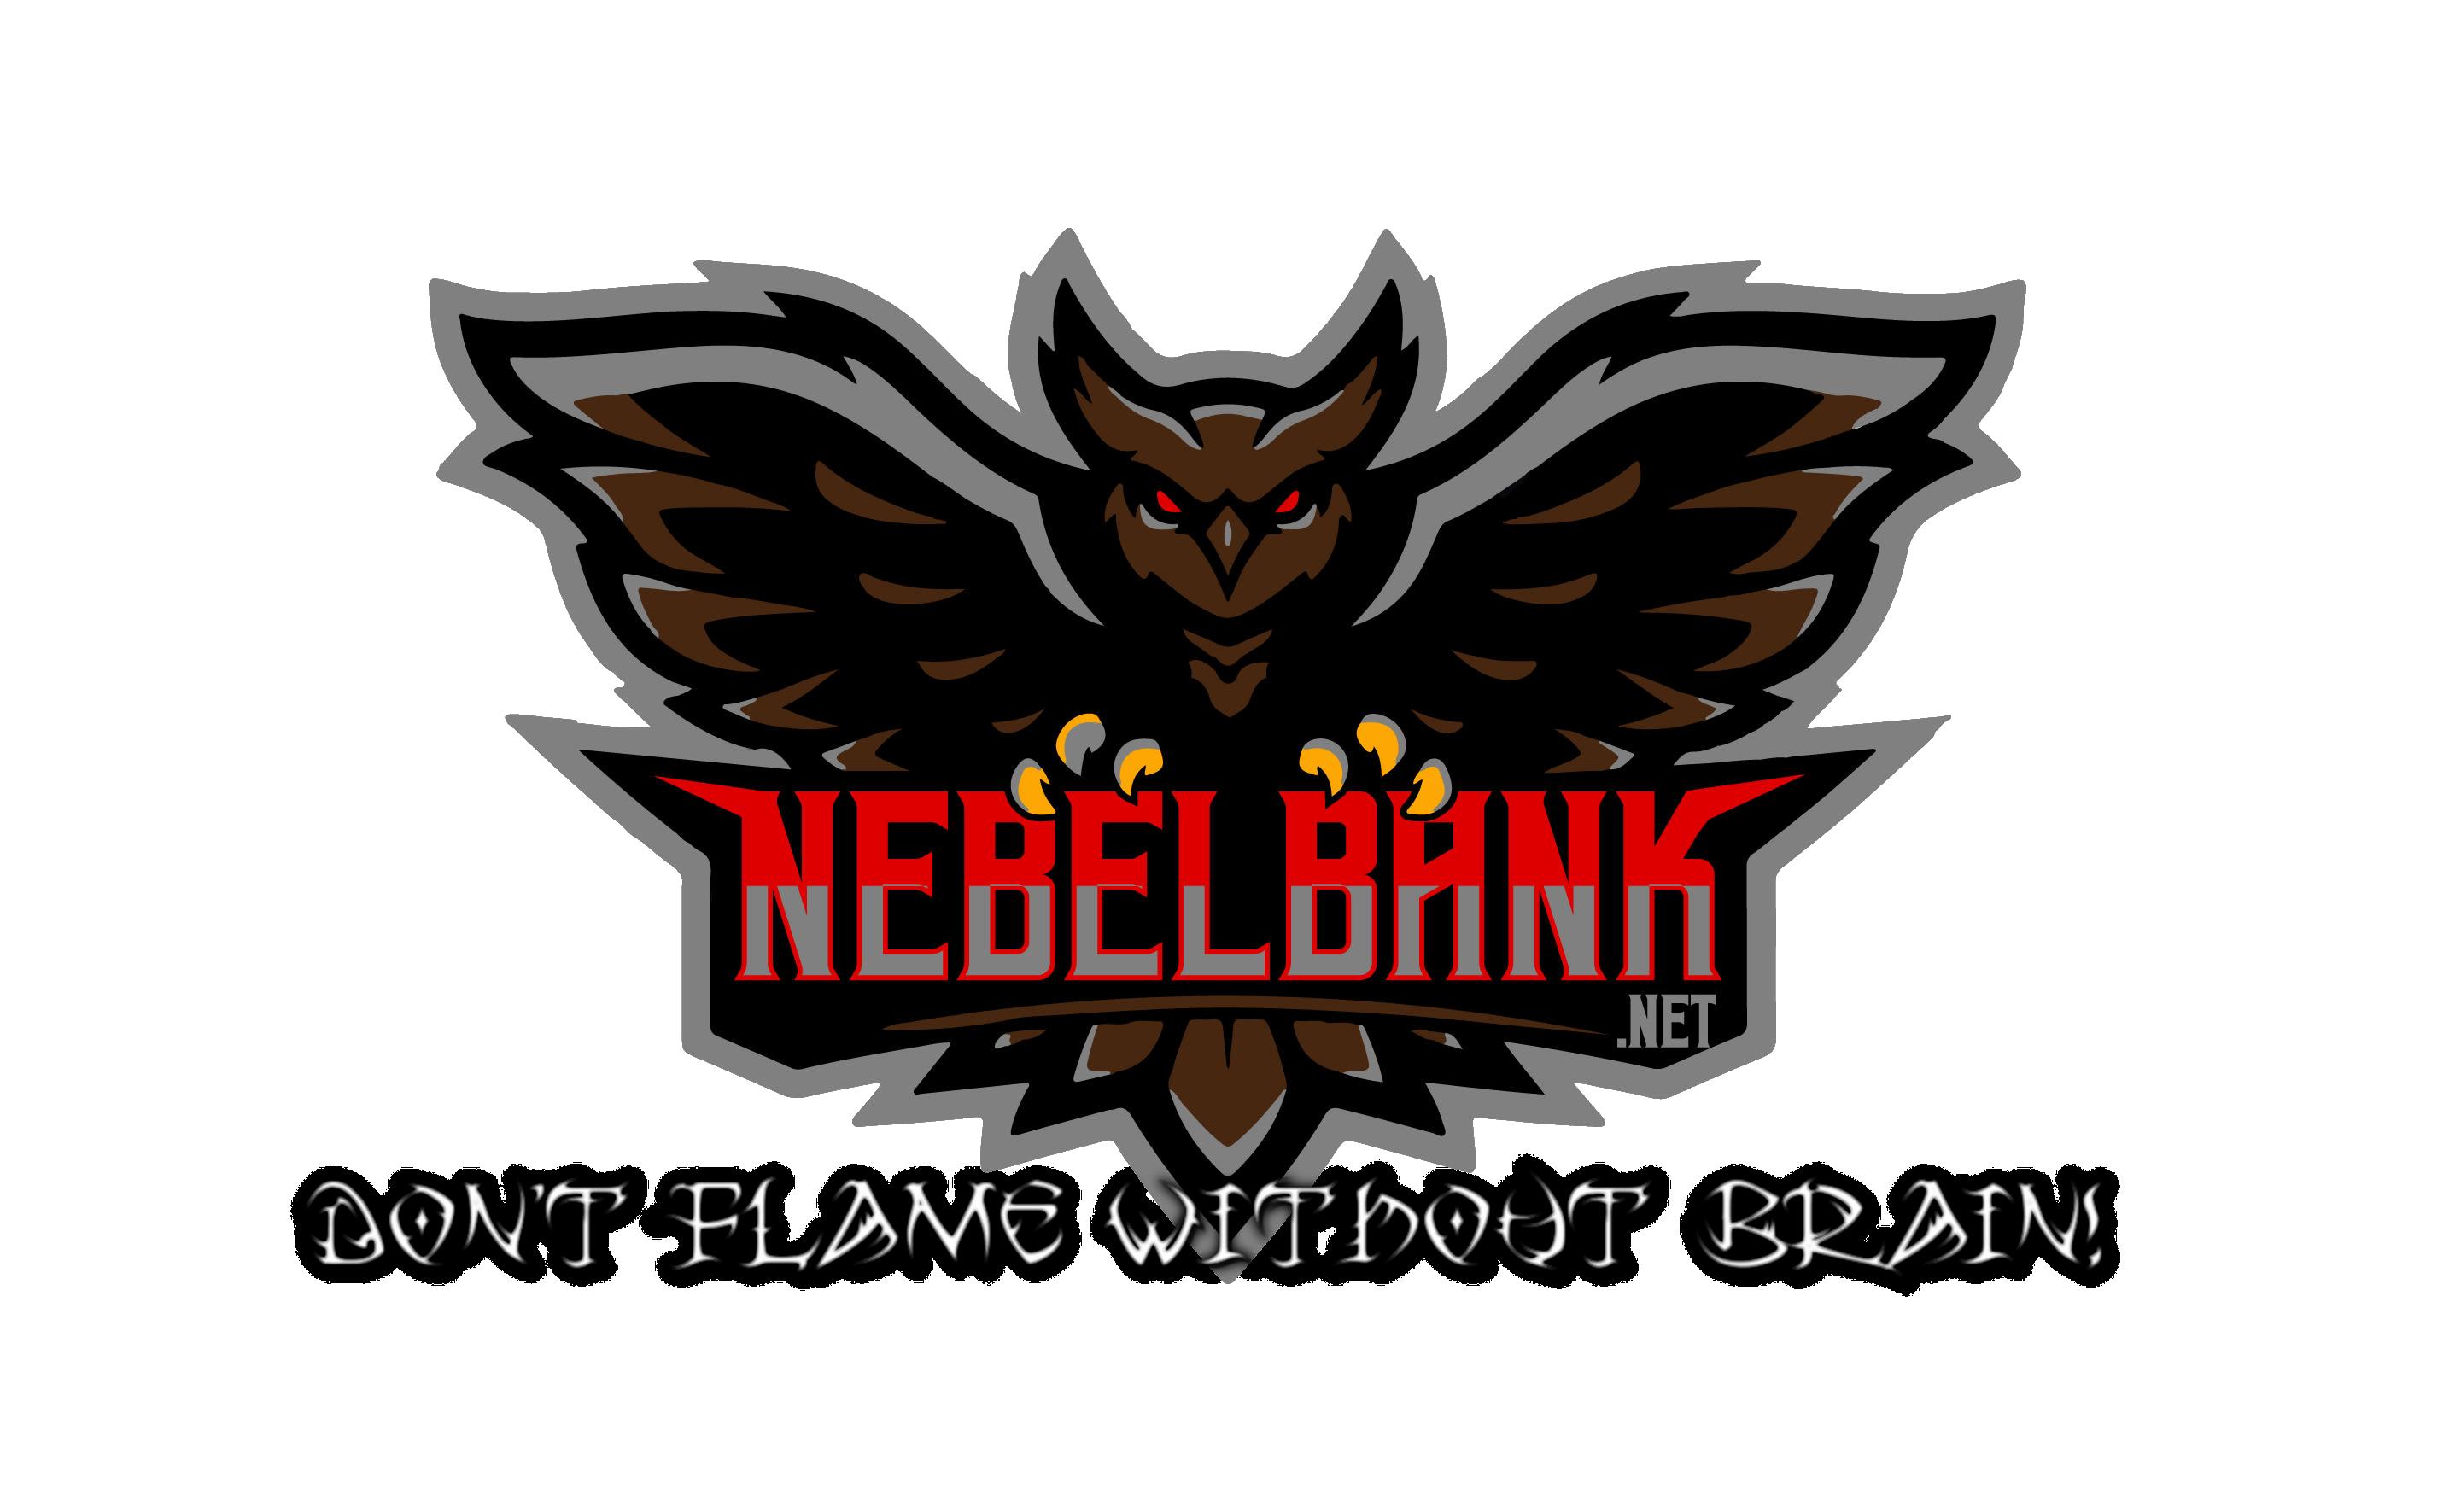 Nebelbank.net